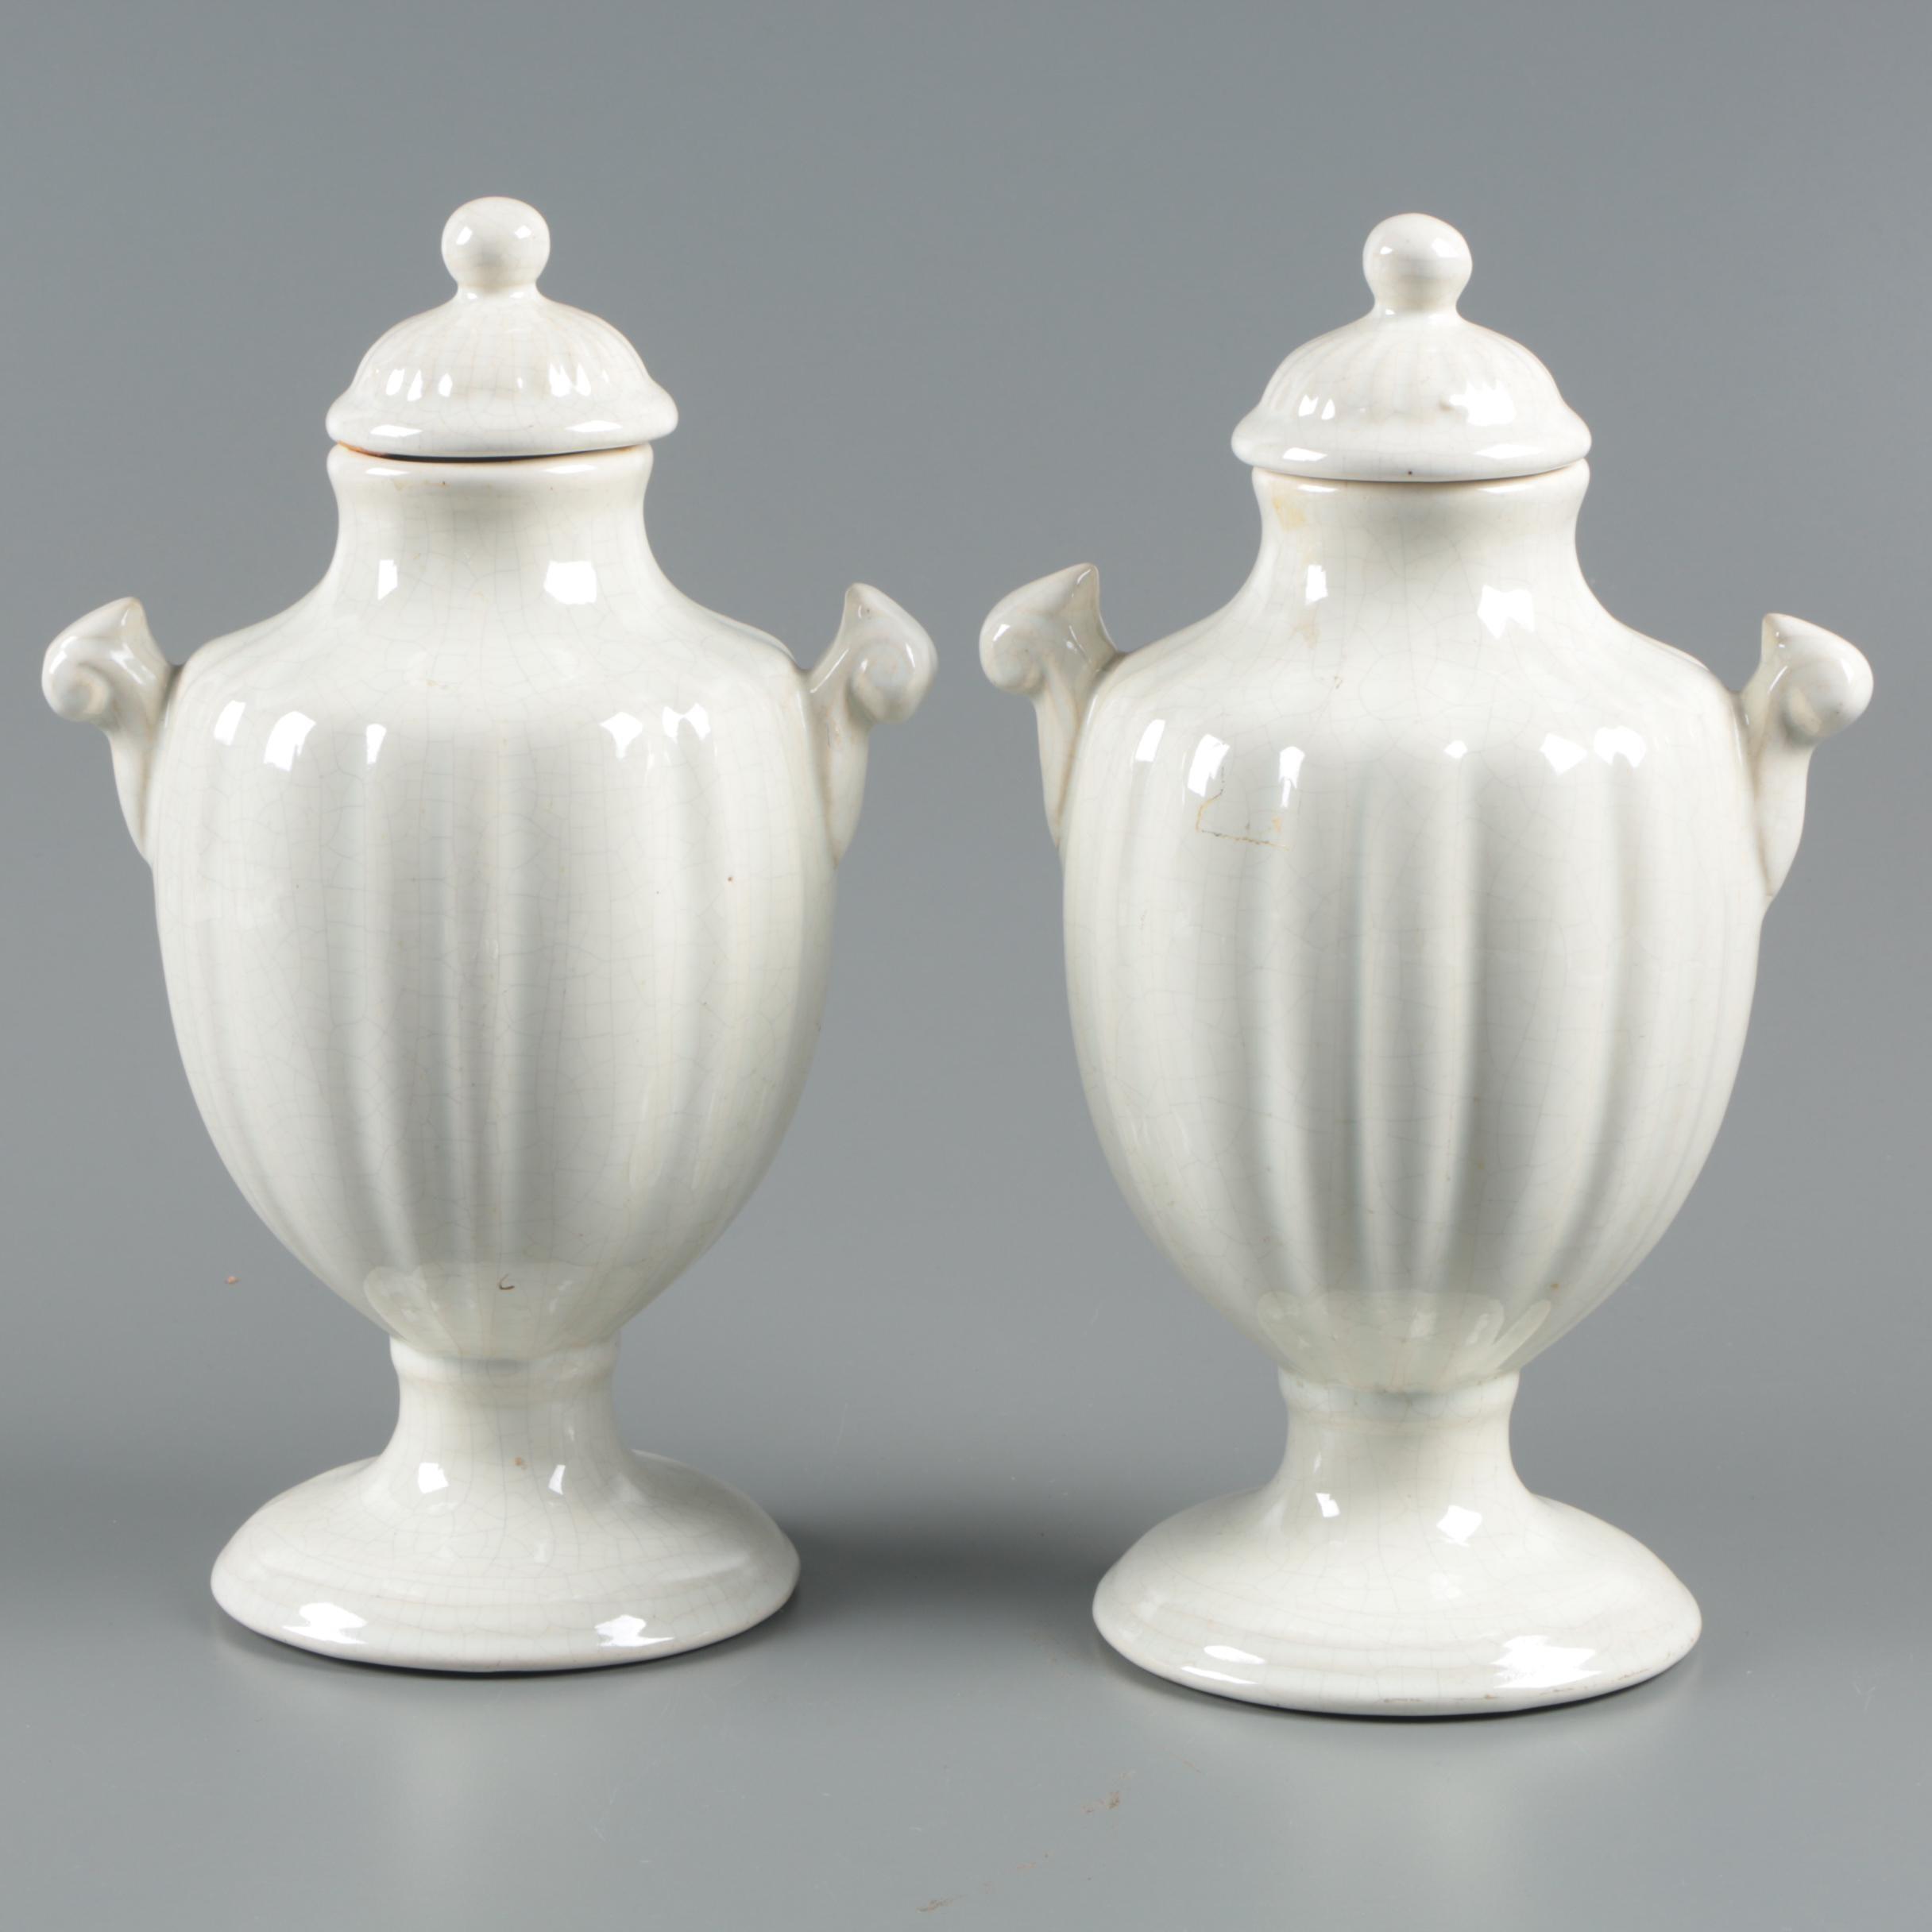 Glazed White Earthenware Urns